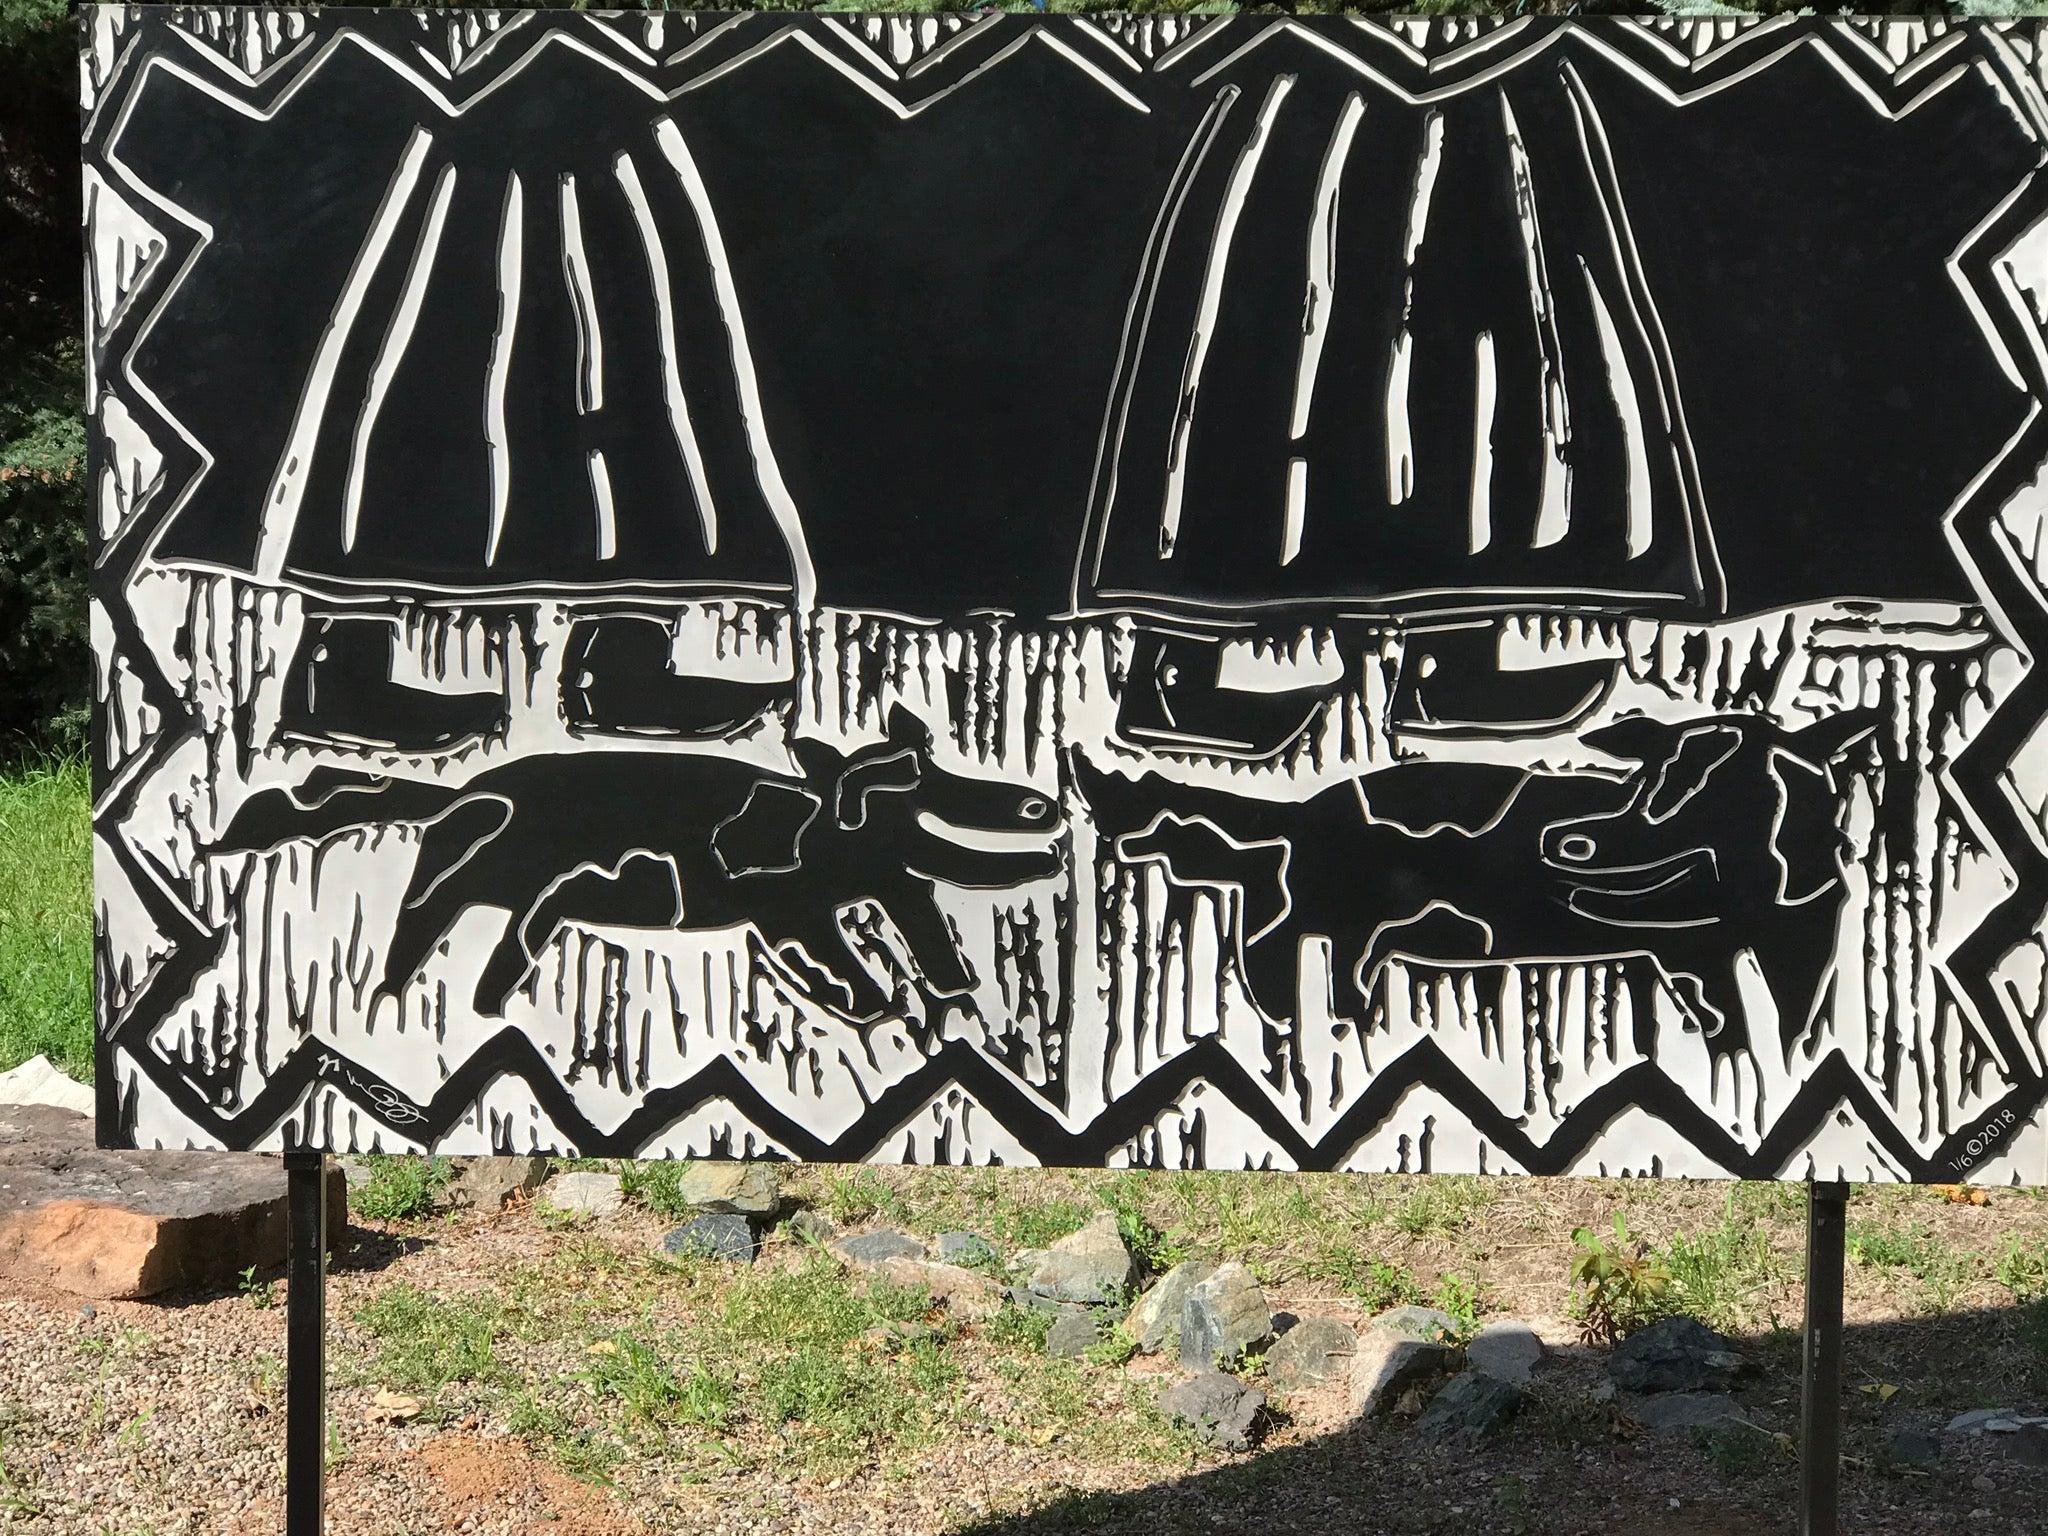 They Walk Together, Melanie Yazzie flat panel sculpture women dogs silver black